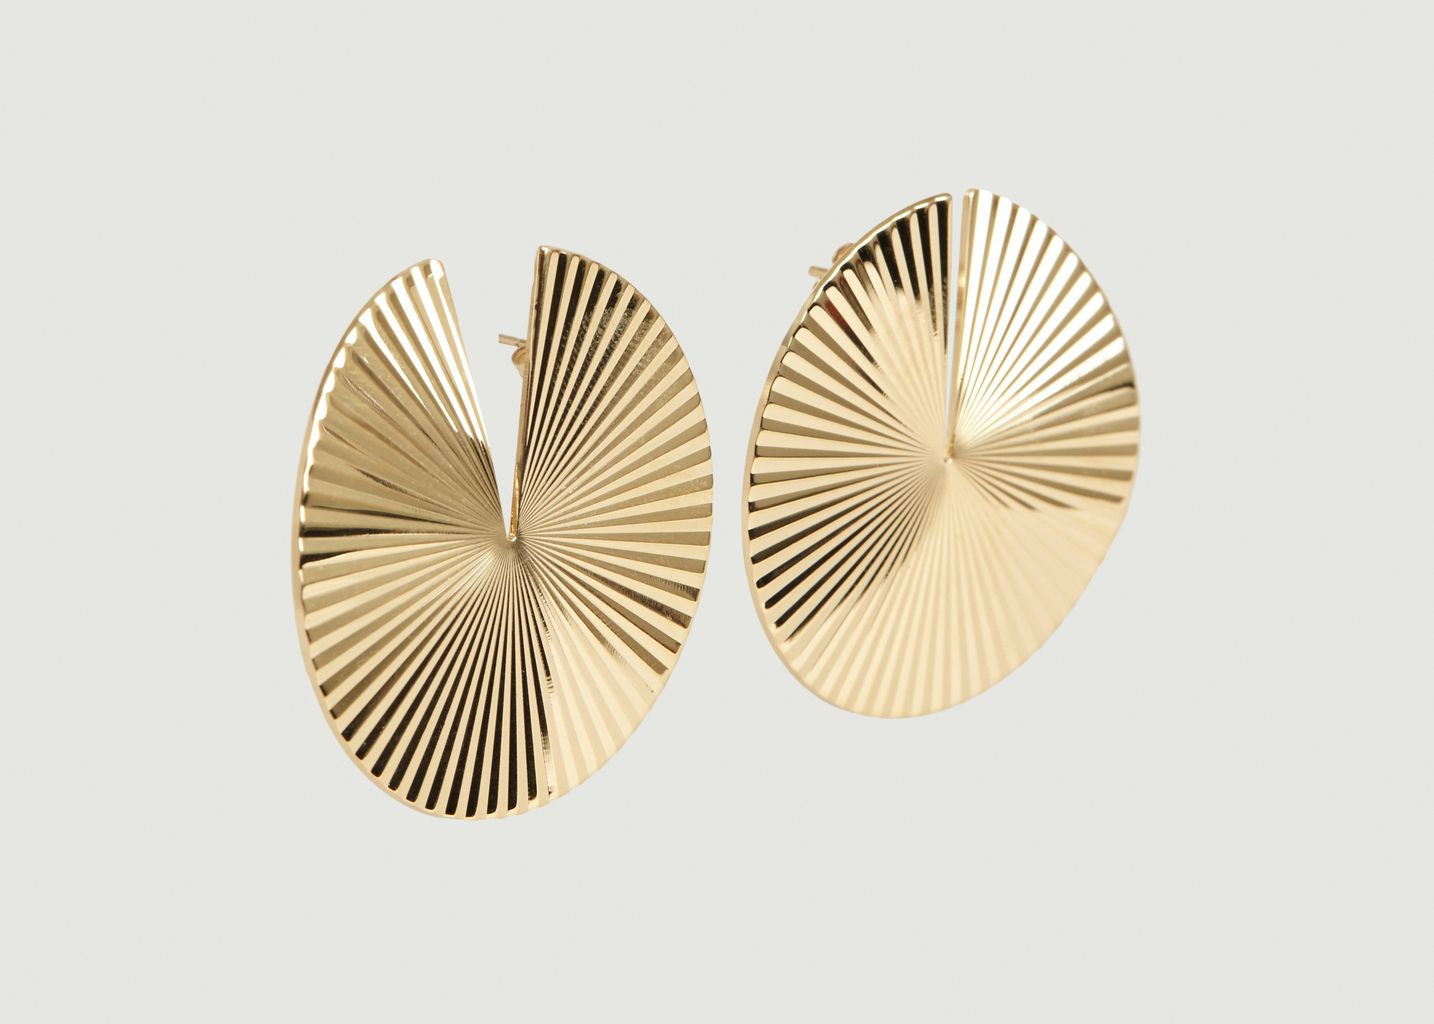 BO Sun Twist - Paola Krauze